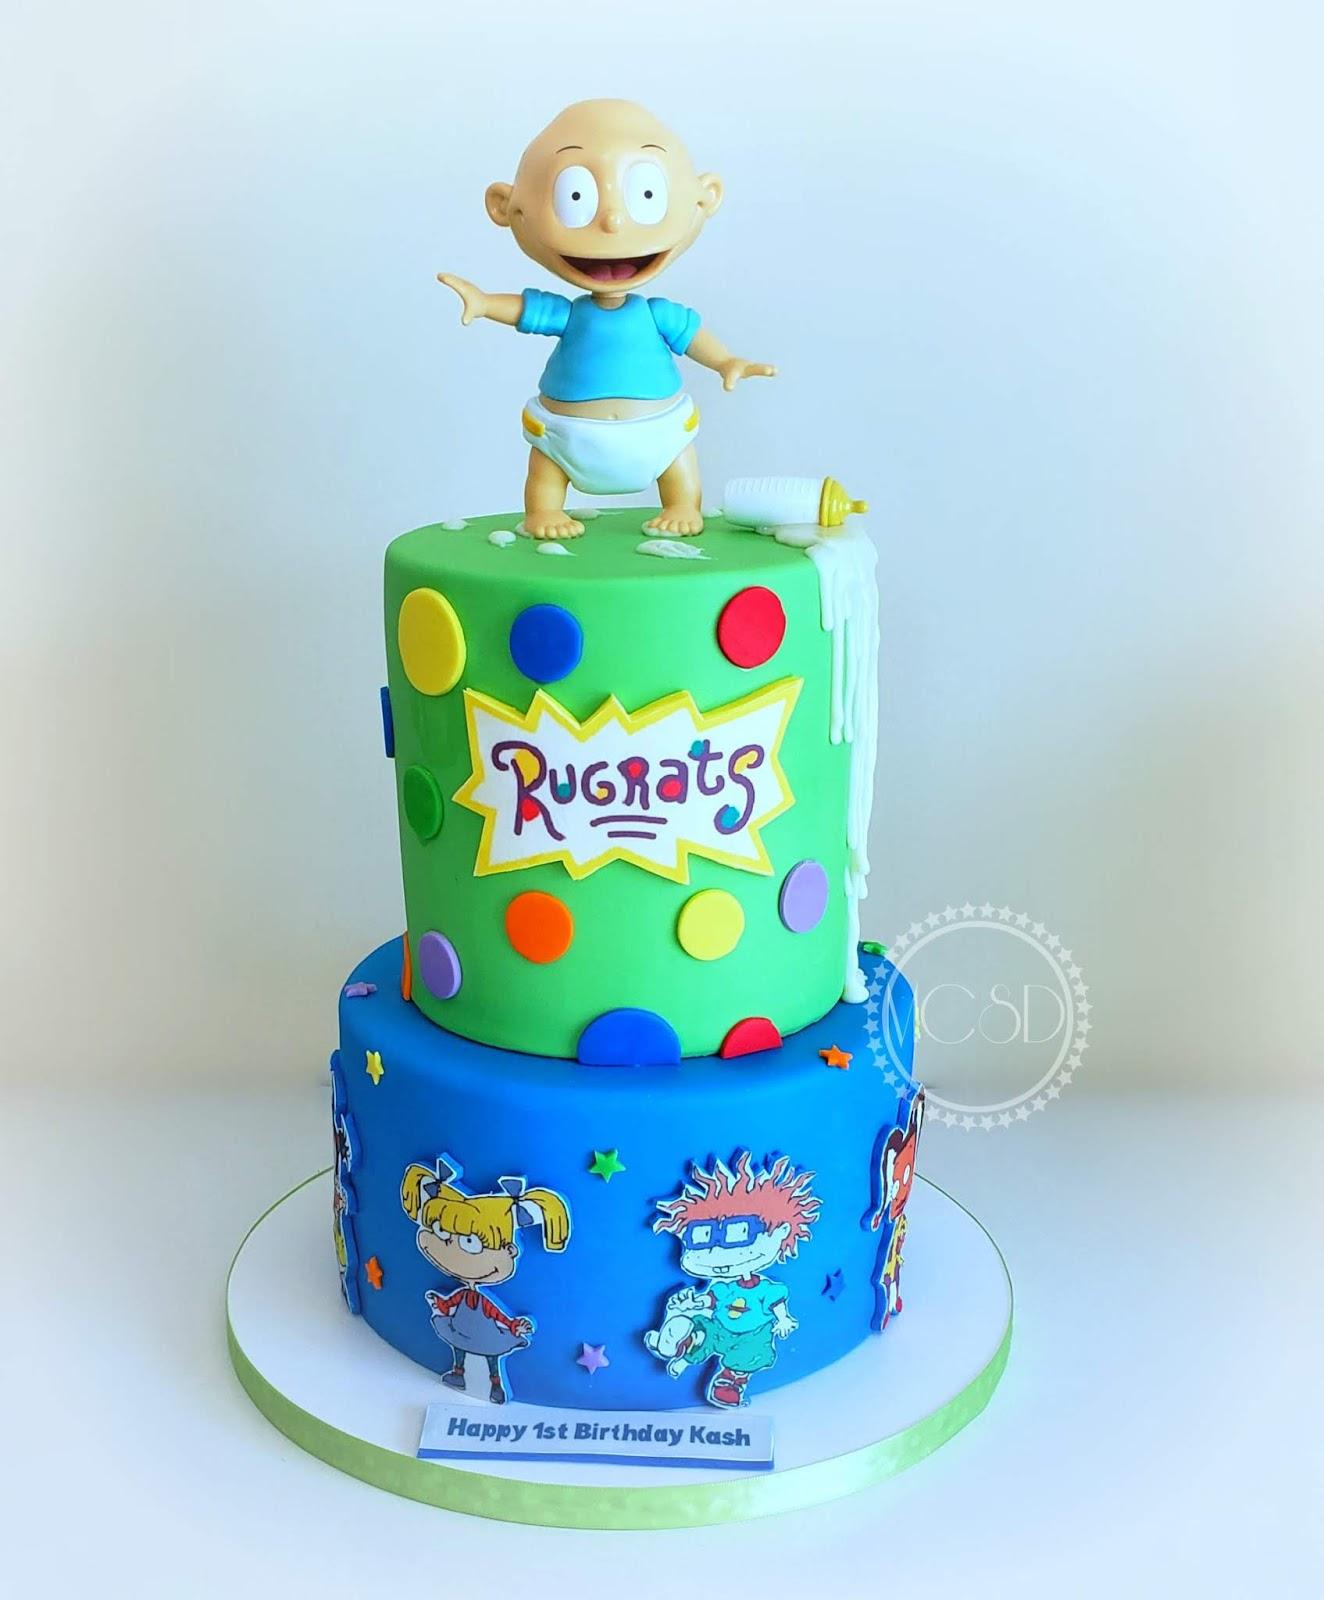 Peachy Cakesbyzana Rugrats 1St Birthday Cake Funny Birthday Cards Online Necthendildamsfinfo